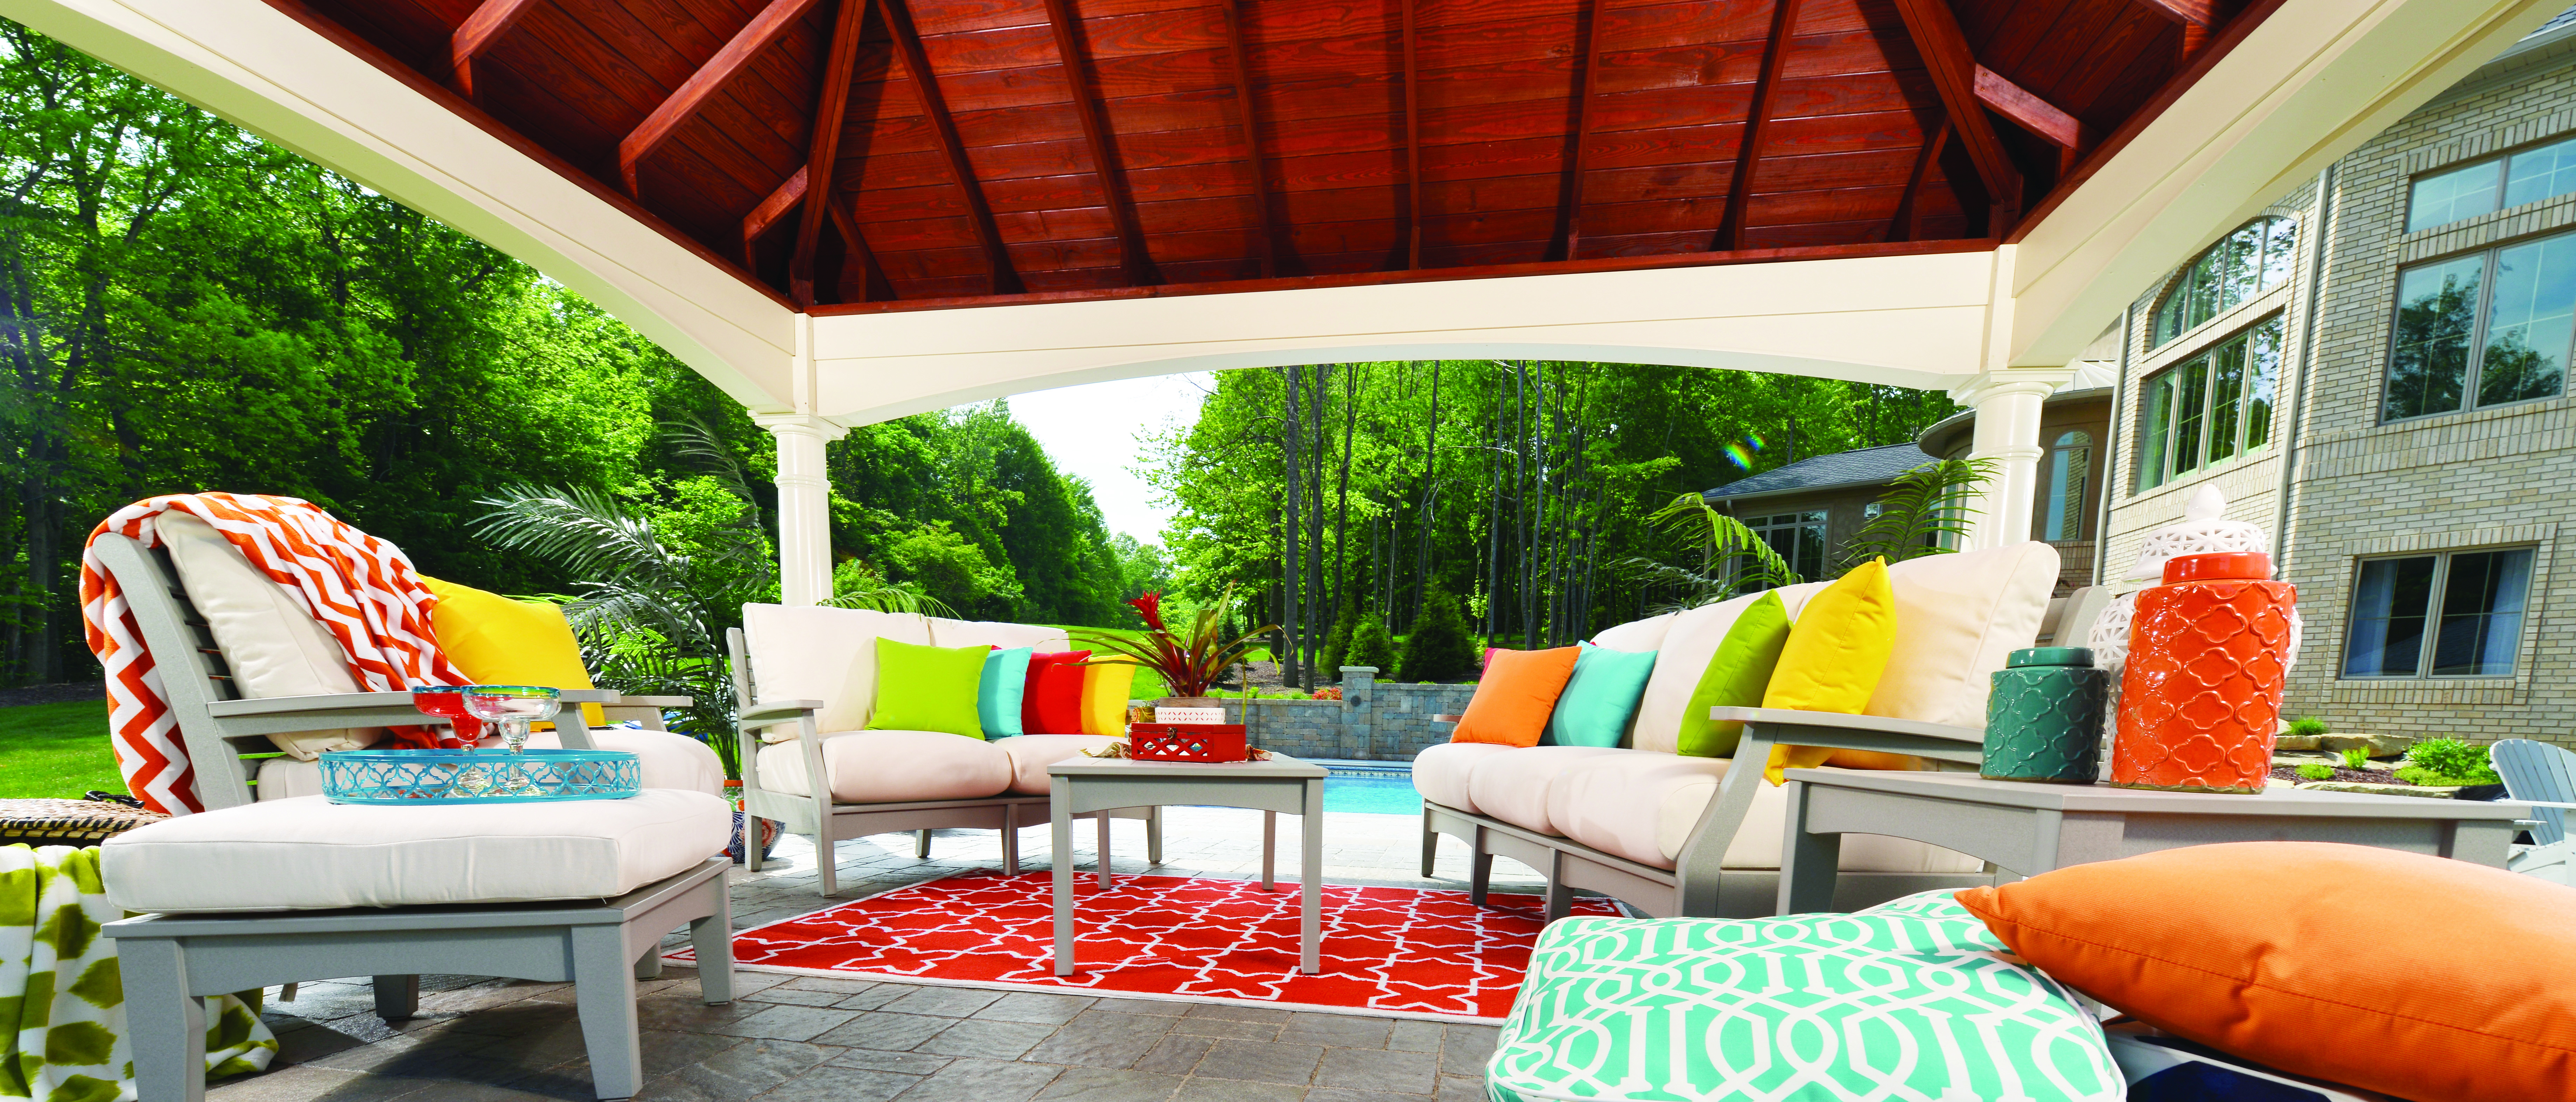 Lifestyles Furniture Columbia Mo